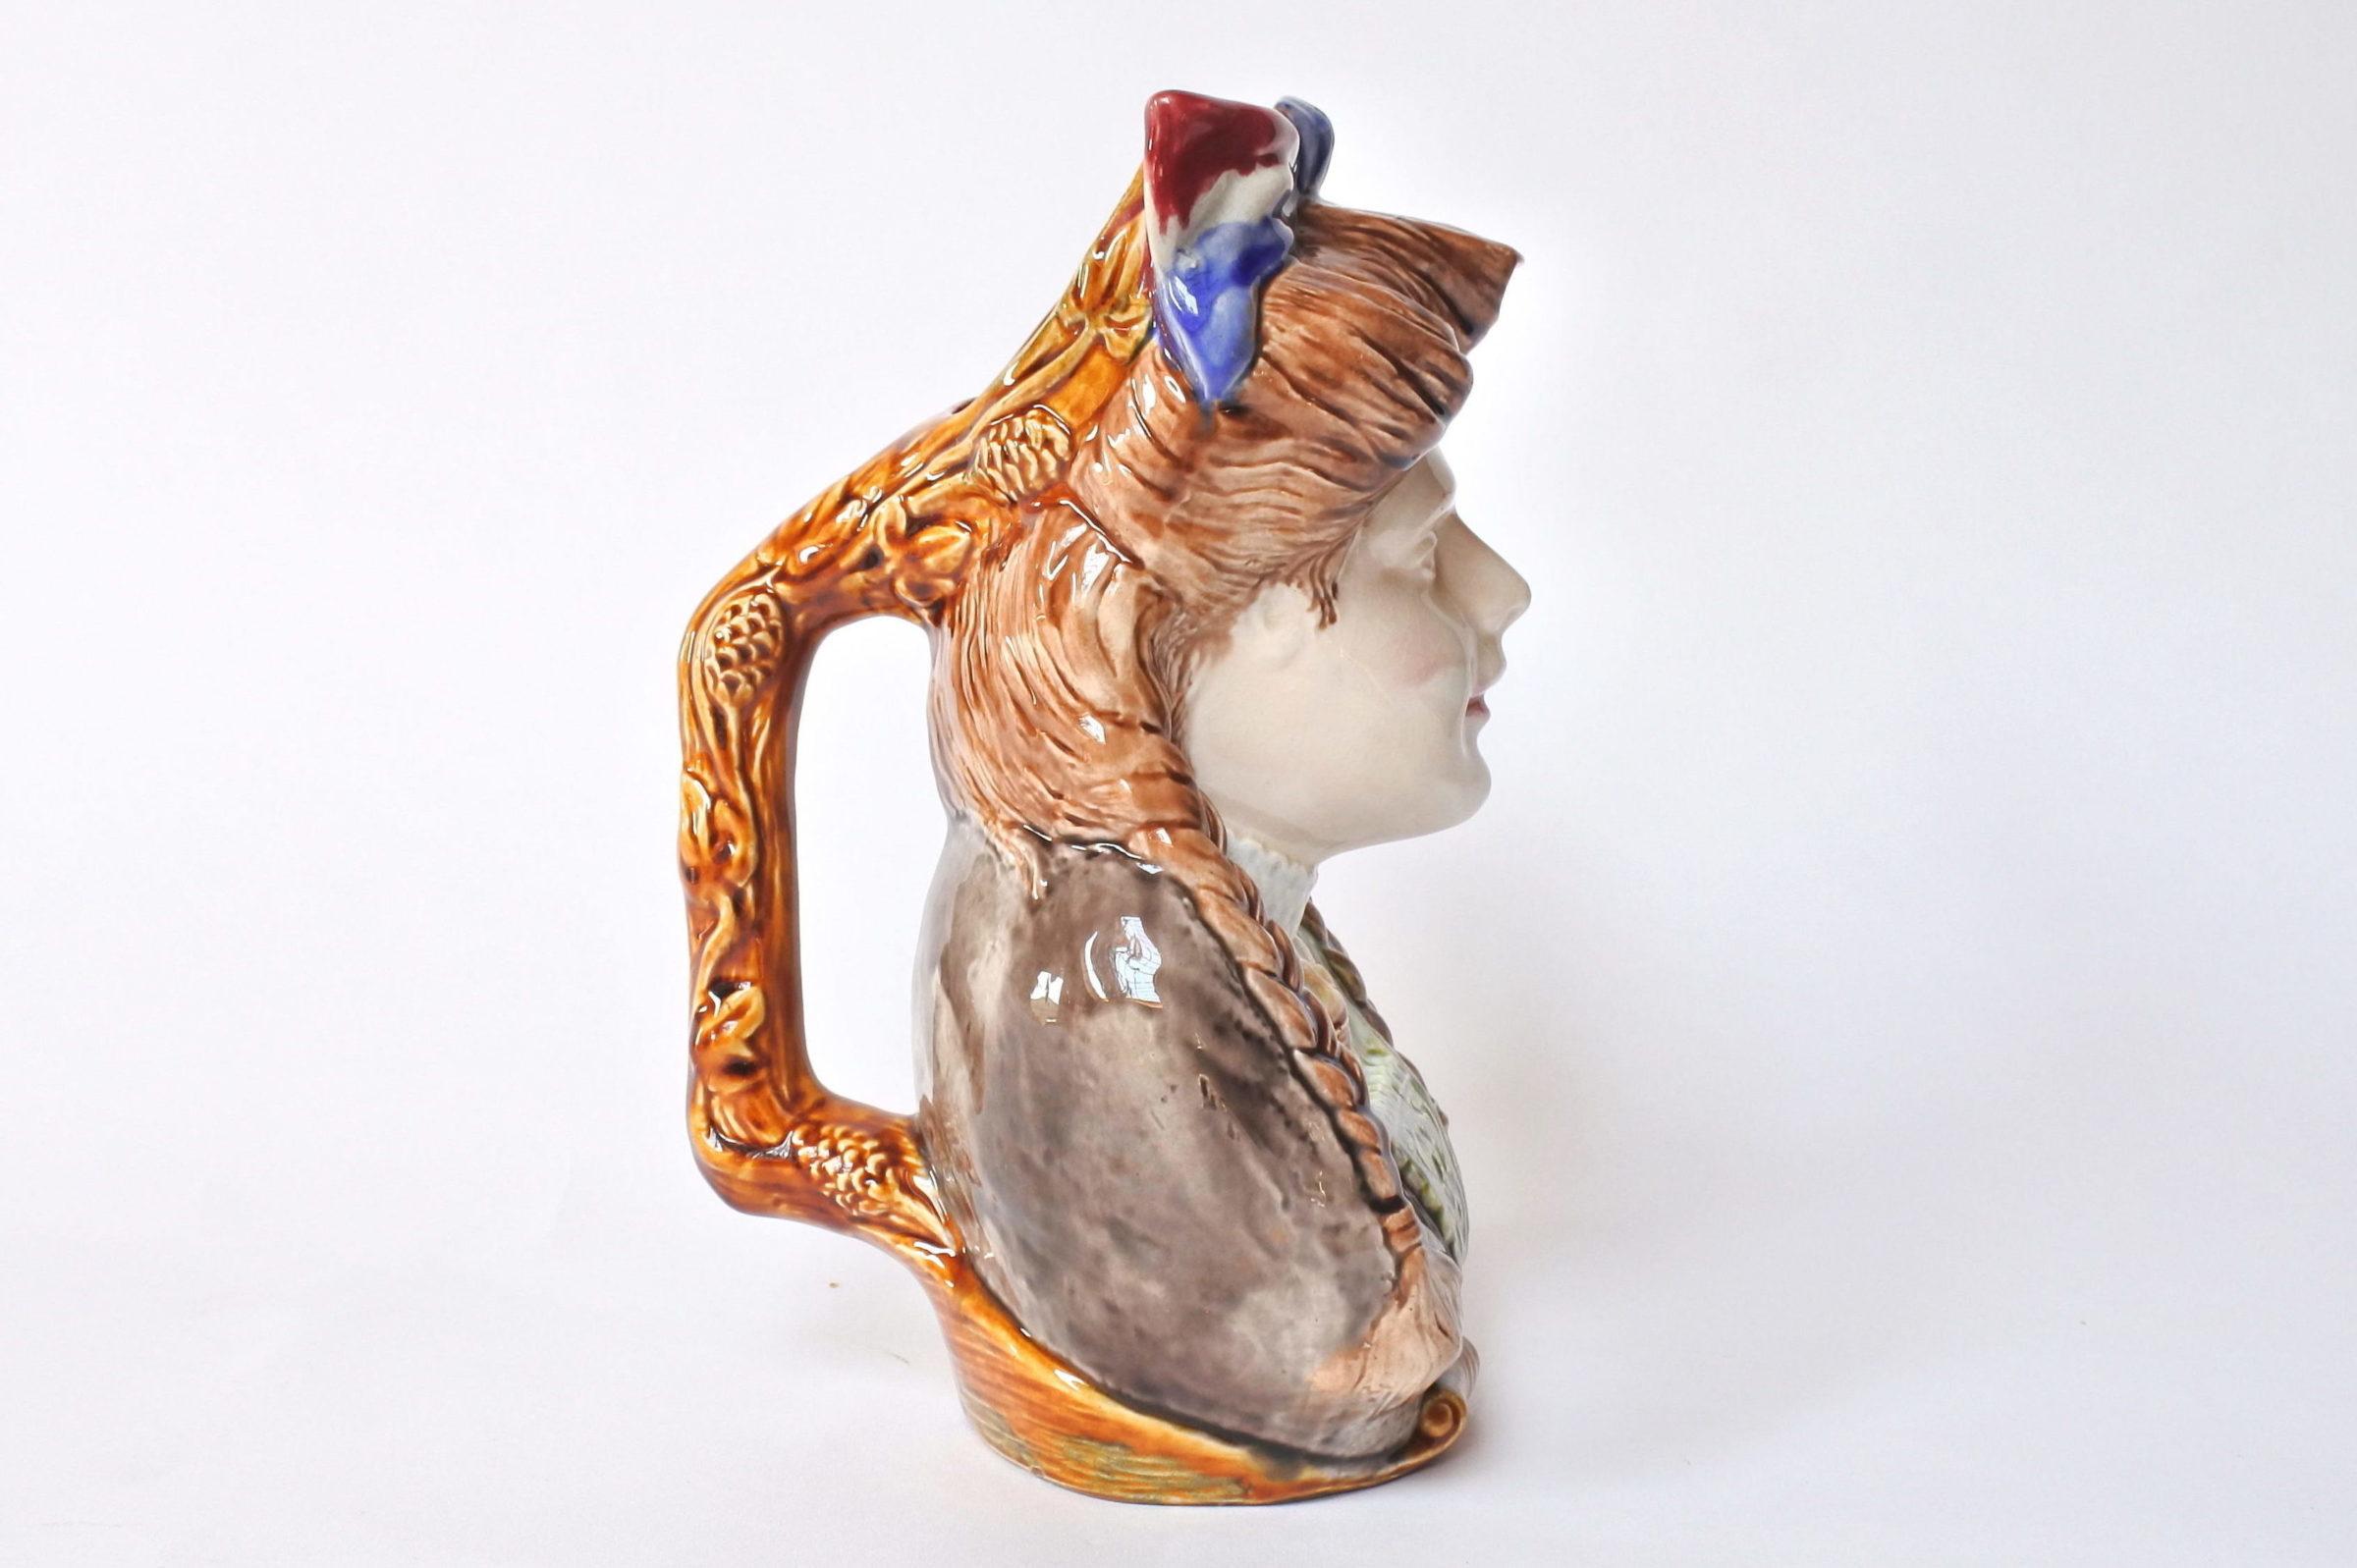 Brocca in ceramica barbotine a forma di volto donna - Onnaing n° 808 - 4